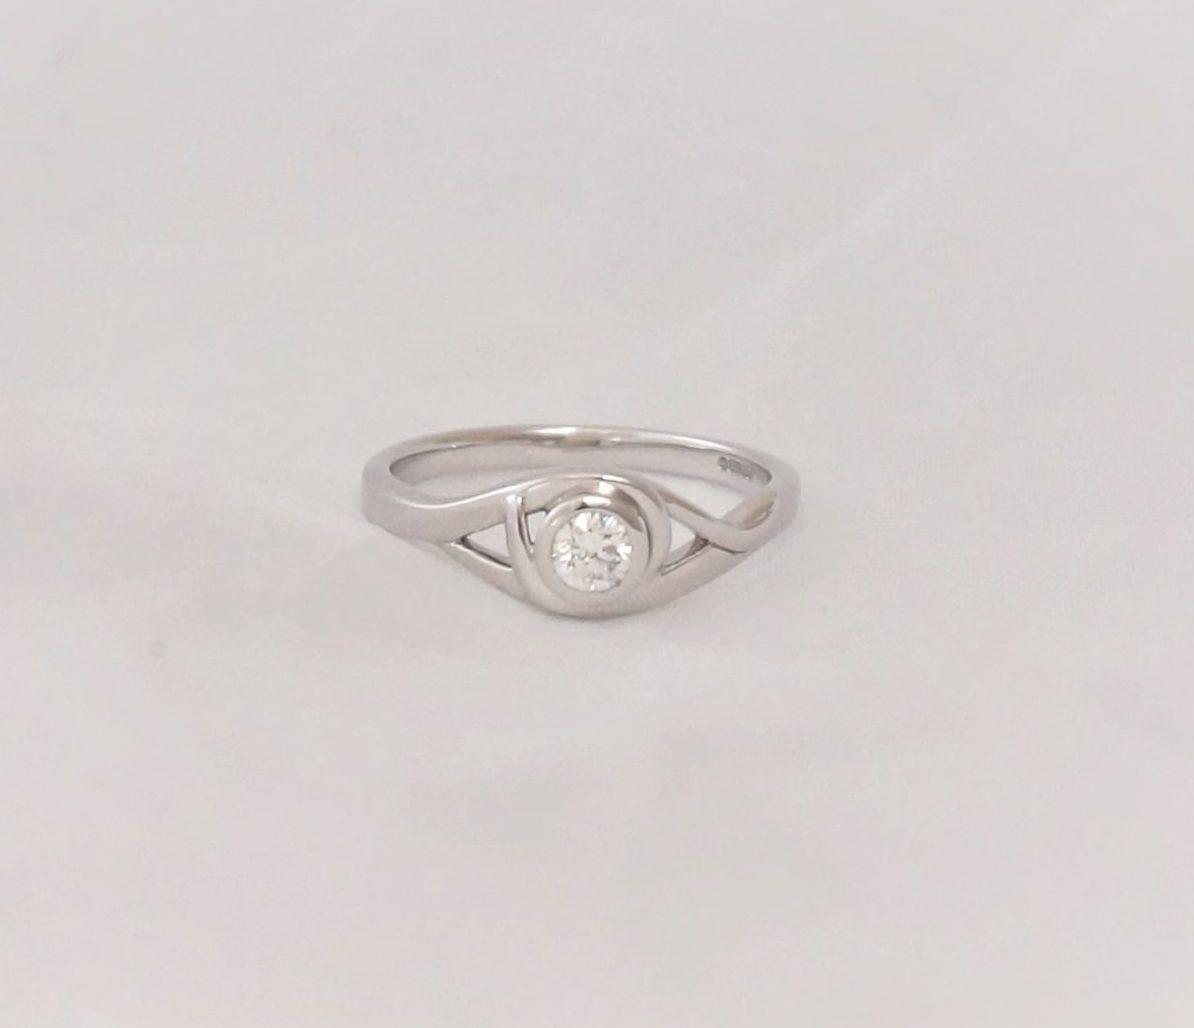 Park Road Jewellery, Bespoke Handmade Engagement Ring 9ct White gold Diamond Personalized Ring